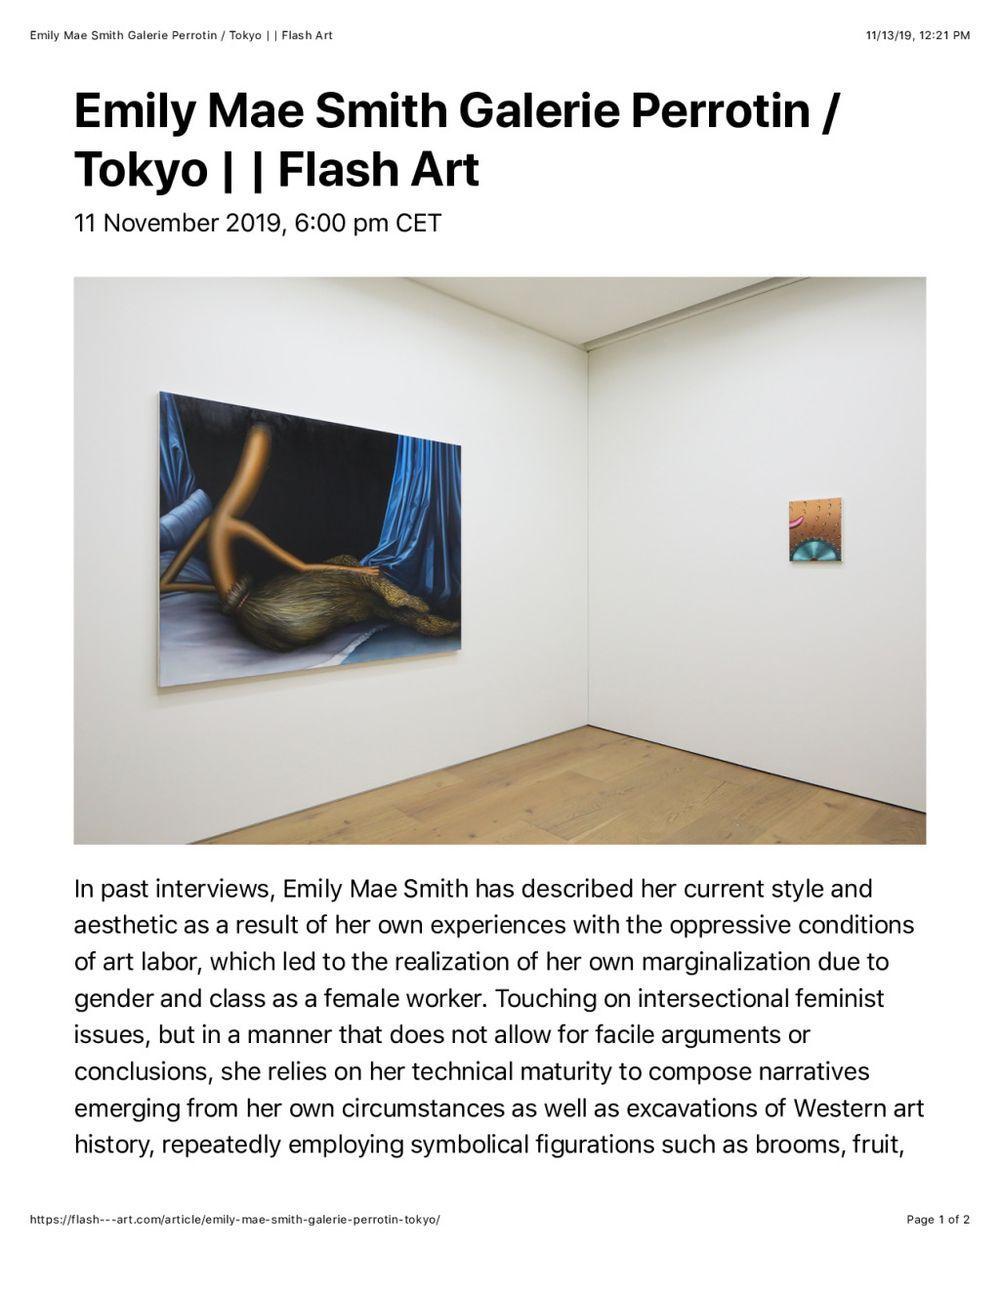 Flash Art | 艾米莉·梅·史密斯